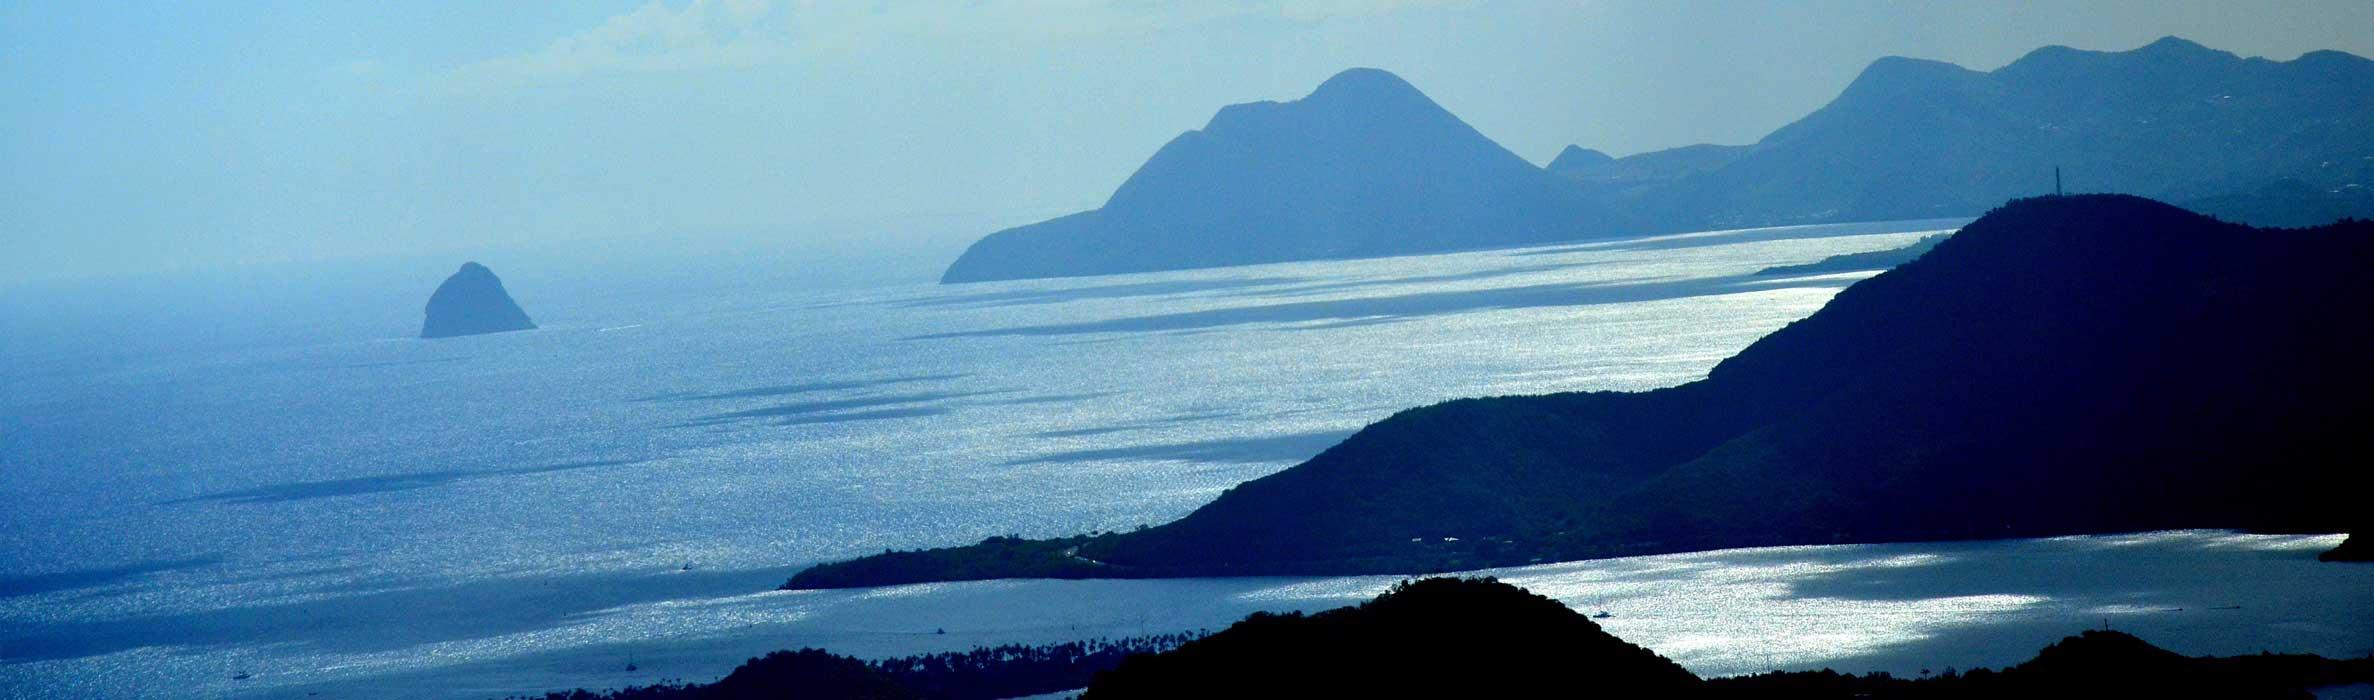 Vision Airawak entre Terre et Mer